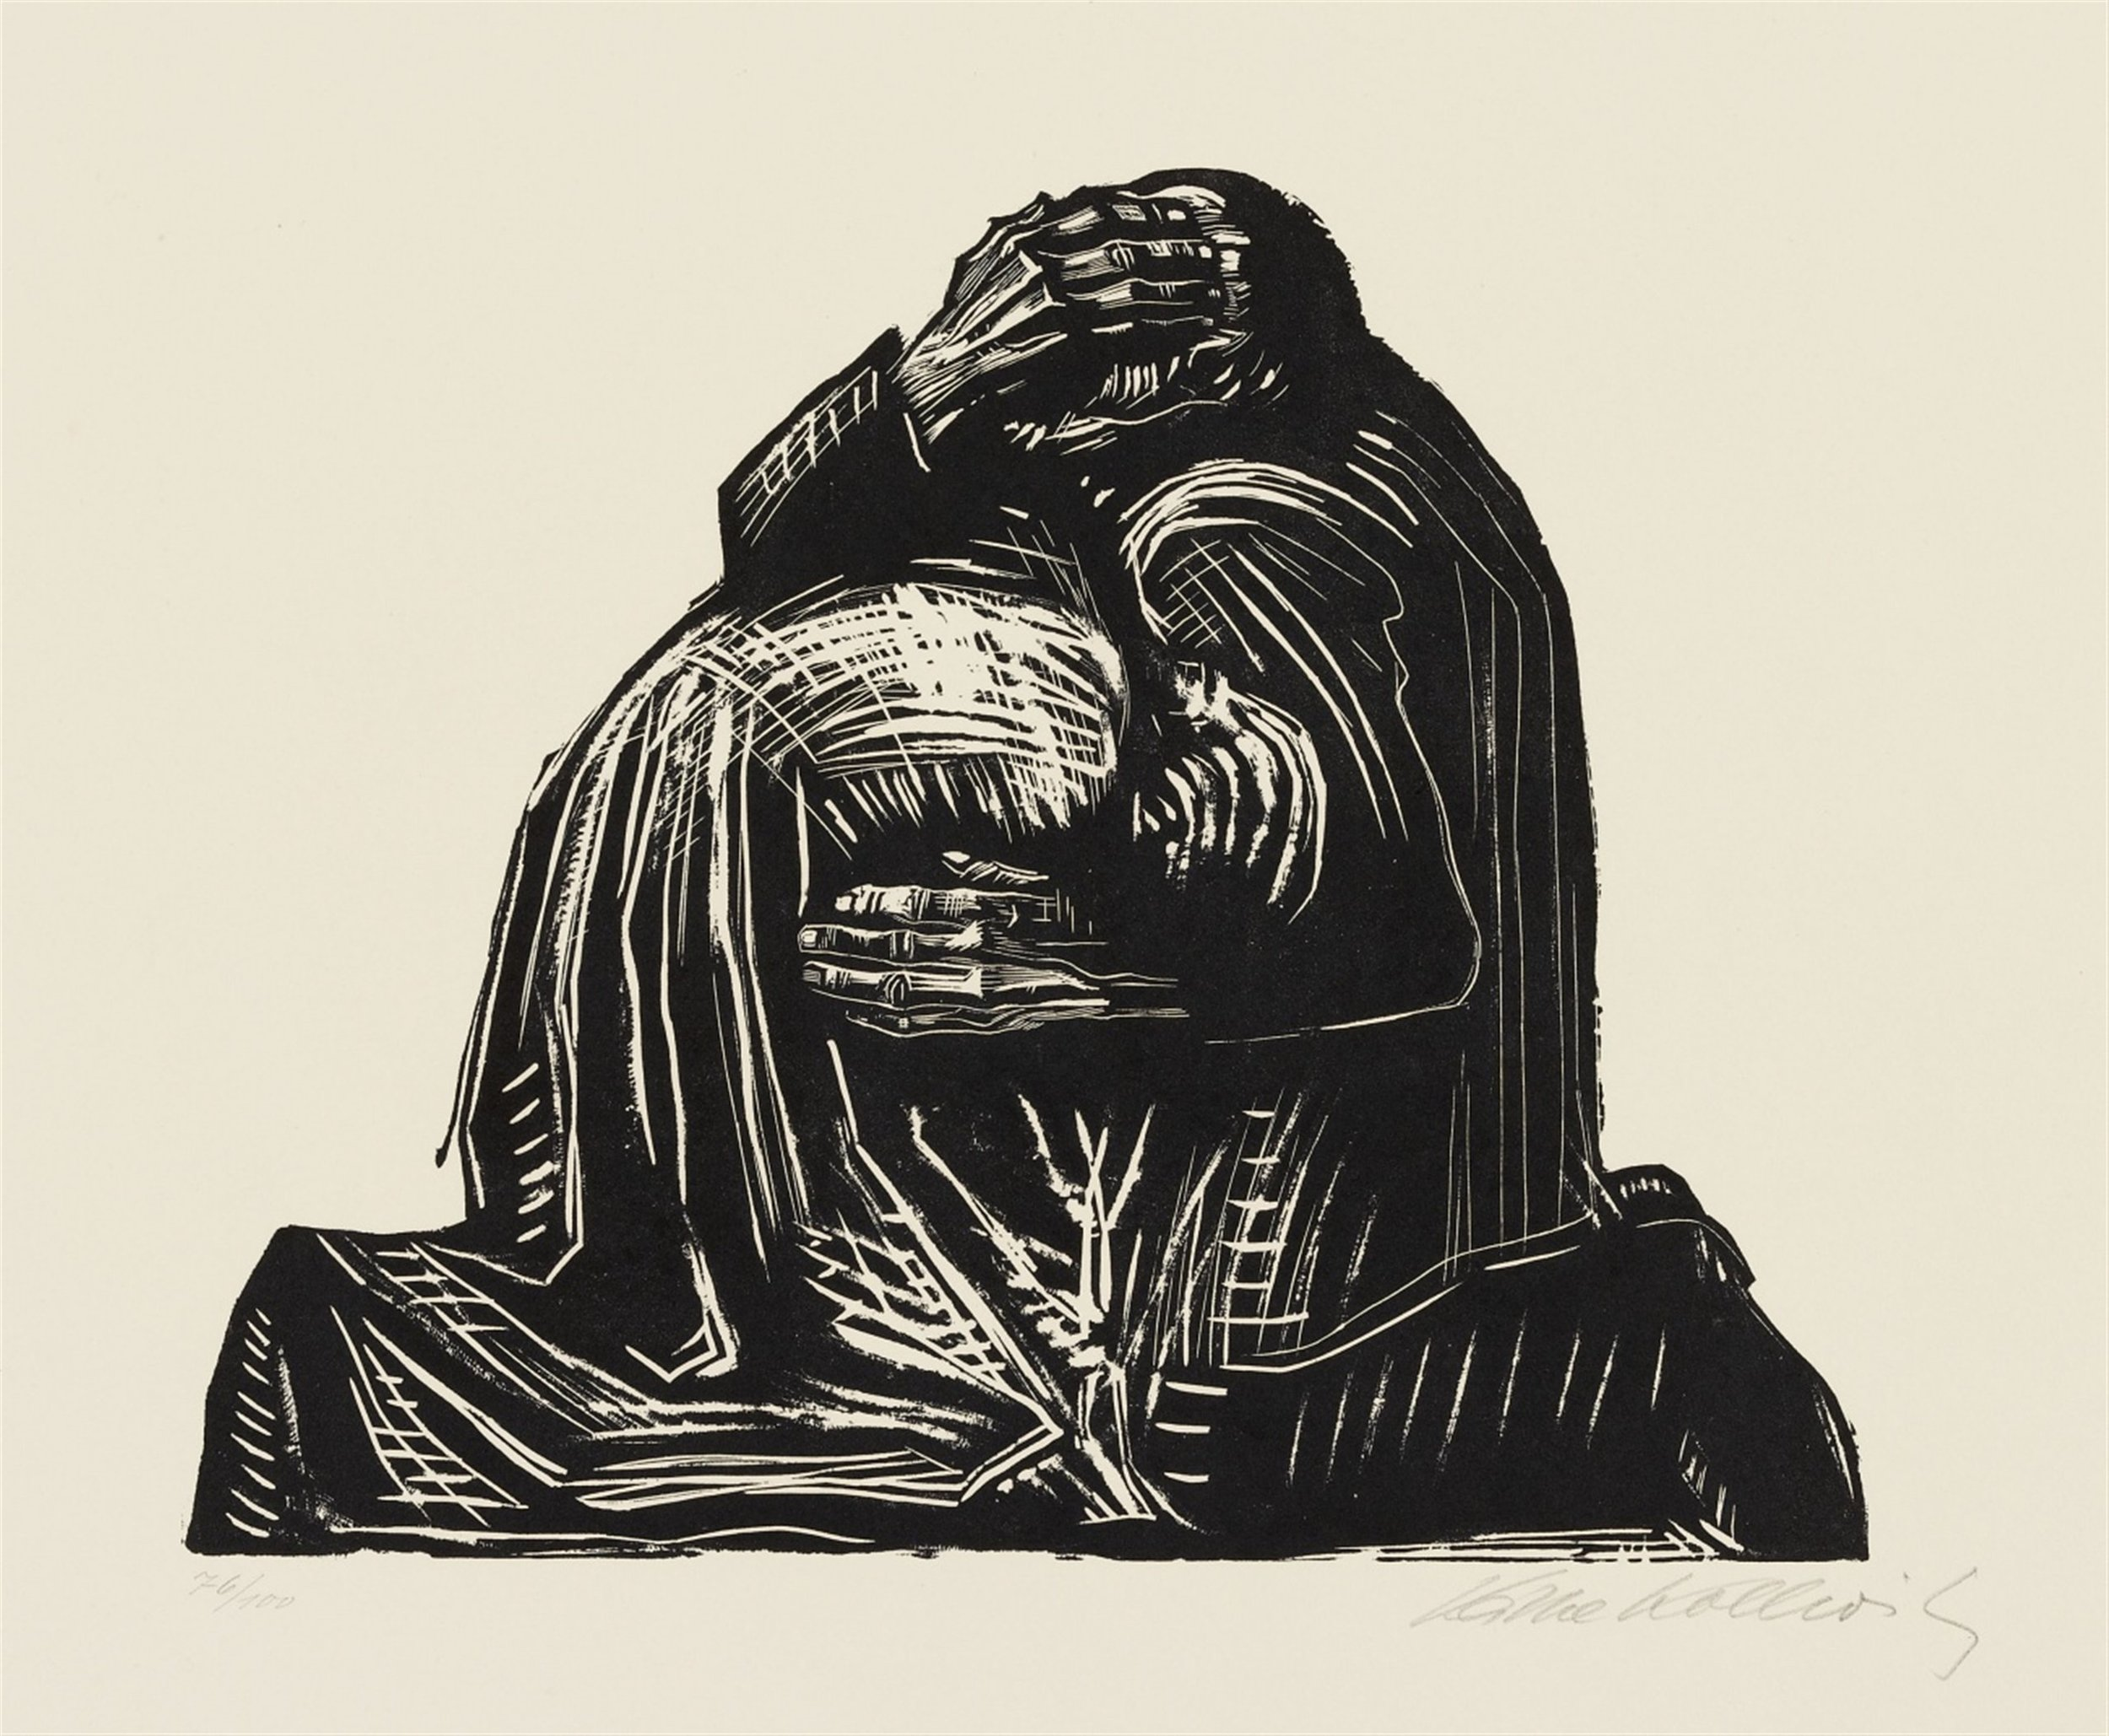 Käthe Kollwitz, Die Eltern (The Parents), from Krieg, woodcut, 1921/22